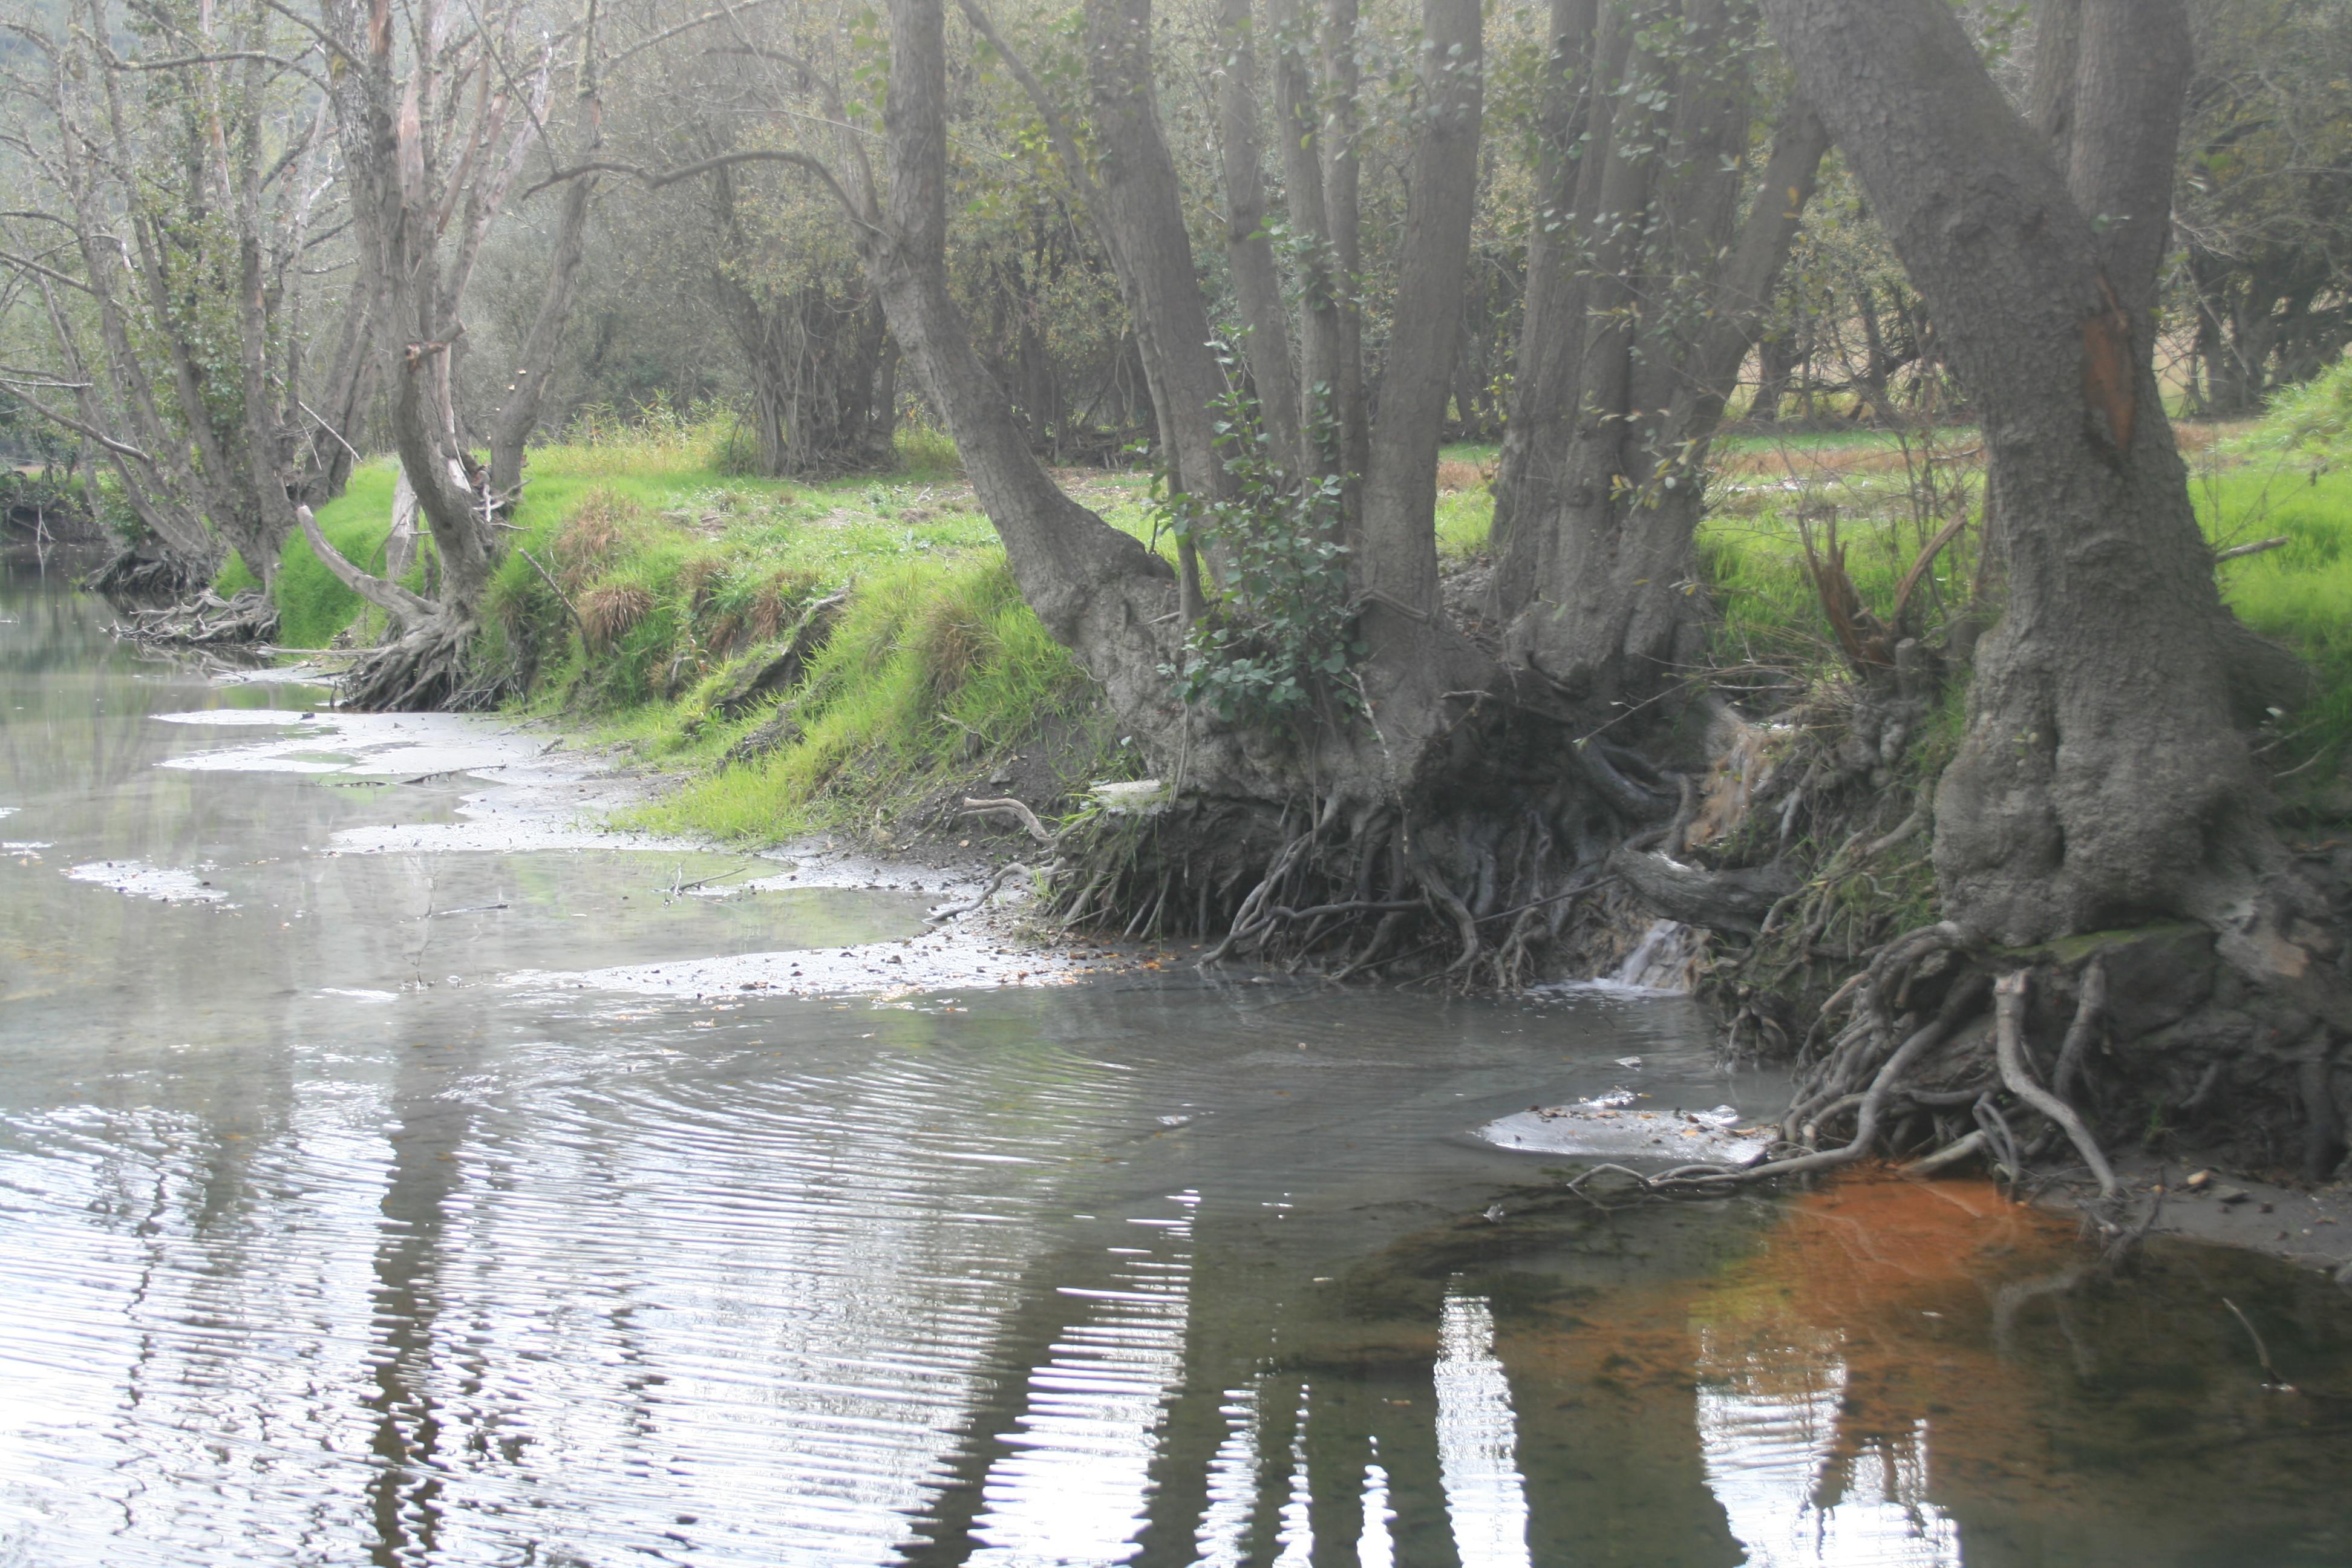 O regato Valcovo desembocando no Camba